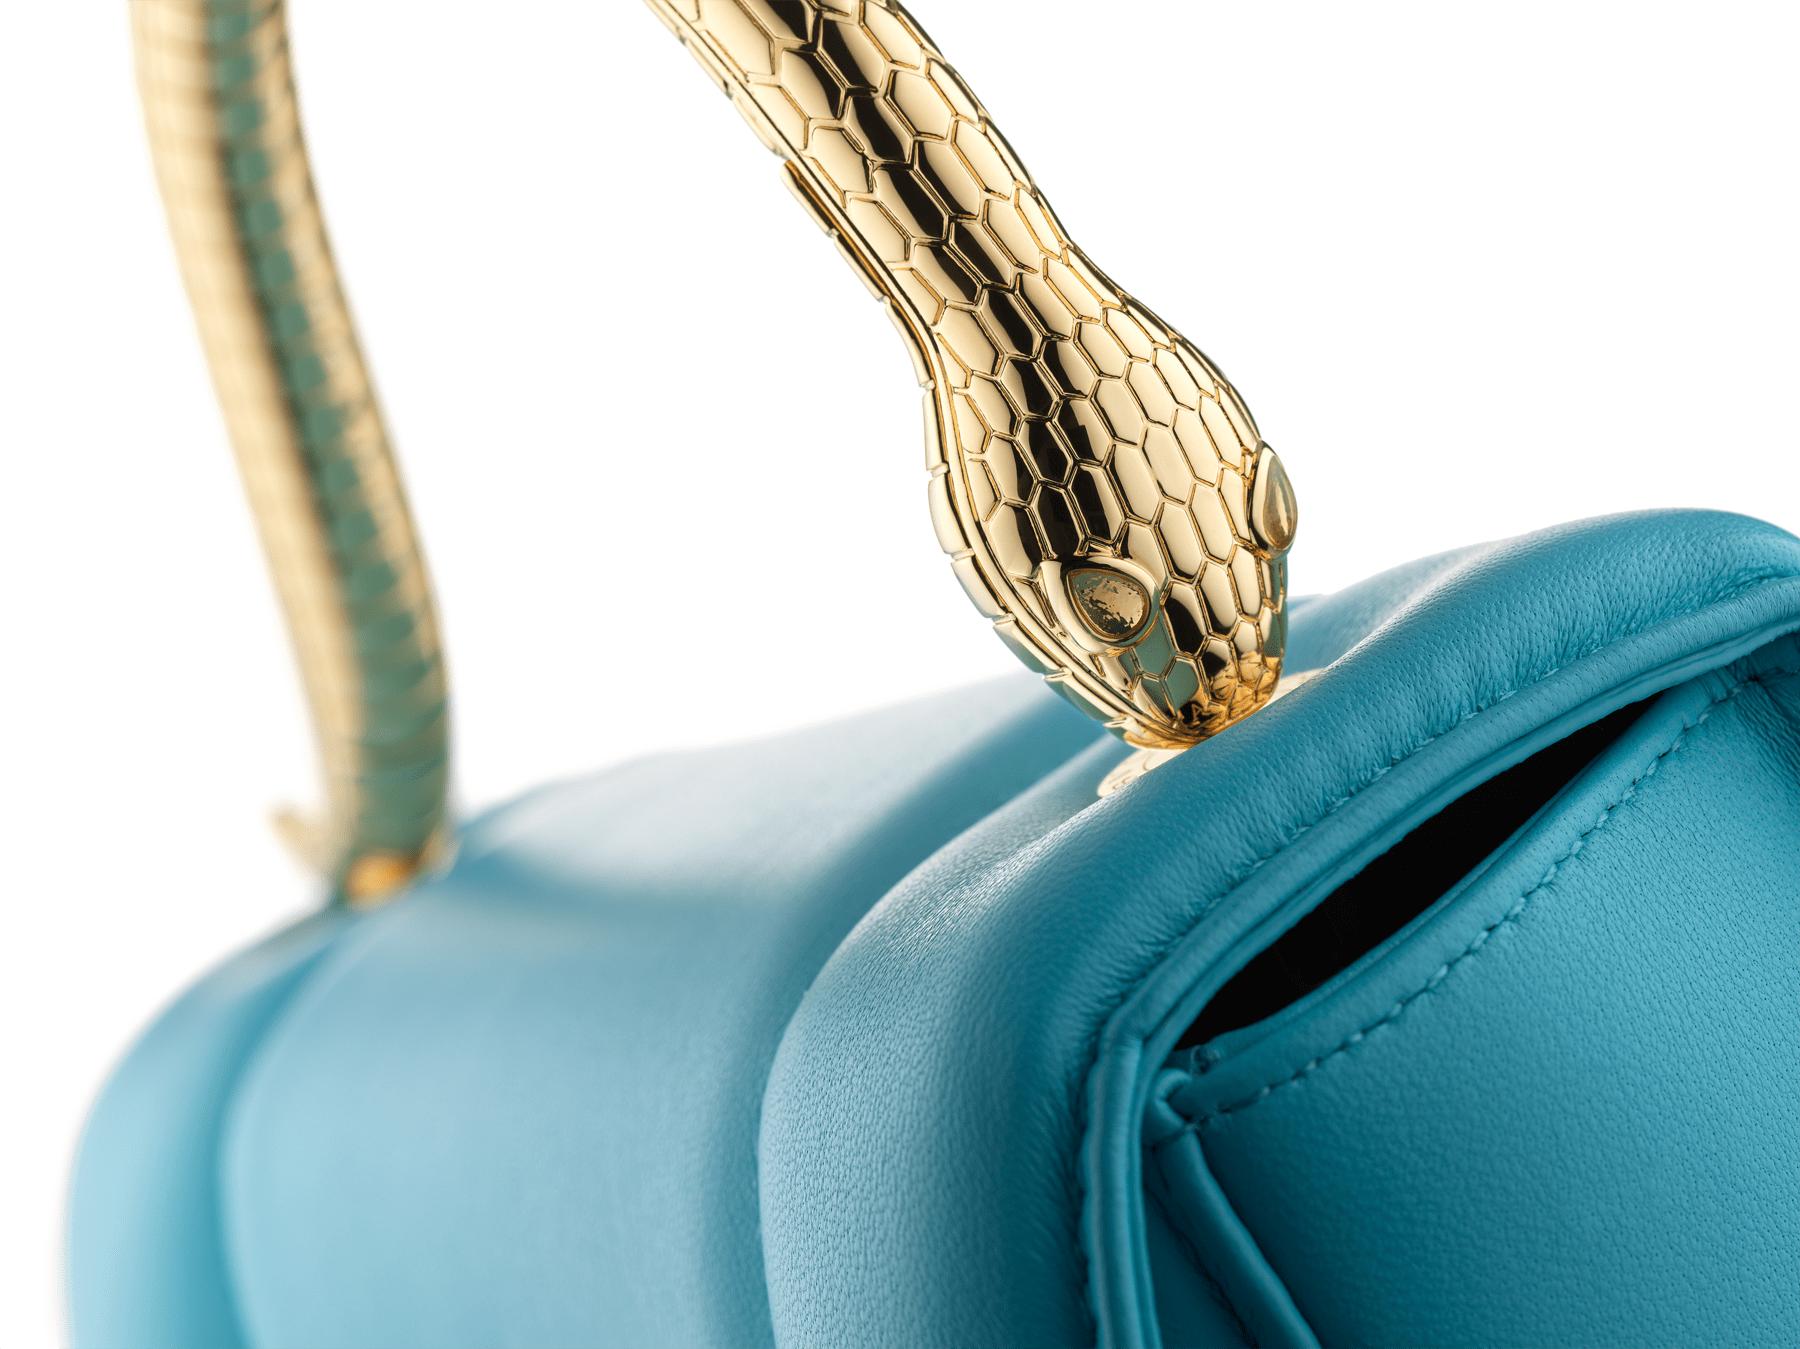 Mary Katrantzou x Bvlgari 手提包,採用柔軟的 Aegean Toapz 藍色絎縫納帕軟面皮,Aegean Toapz 藍色納帕軟面皮襯裡。新式金色黃銅 Serpenti 蛇頭扣環,誘人蛇眼鑲飾水晶。特別版包款。 MK-1142 image 7